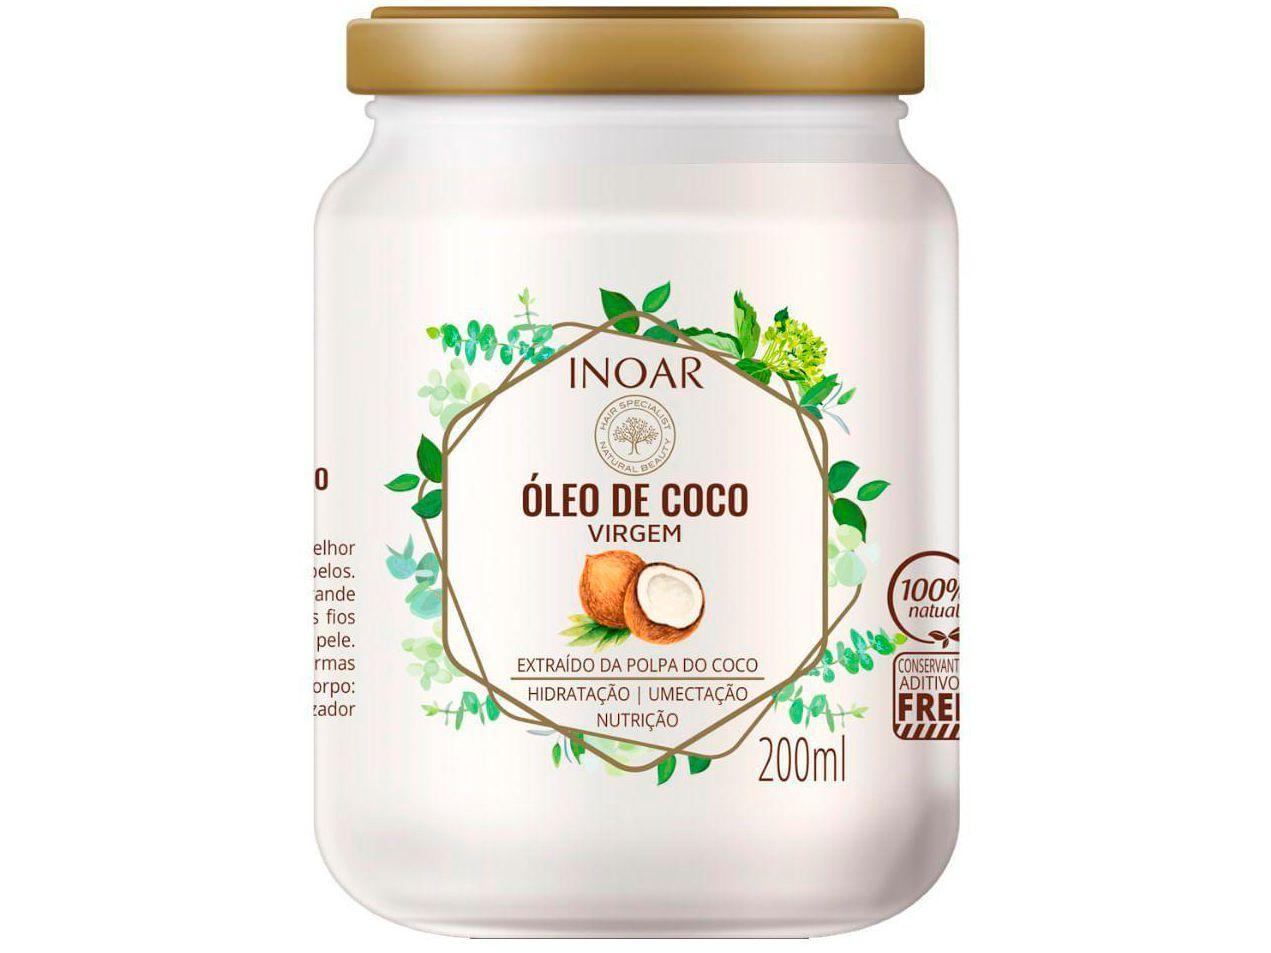 Inoar Óleo de Coco Virgem